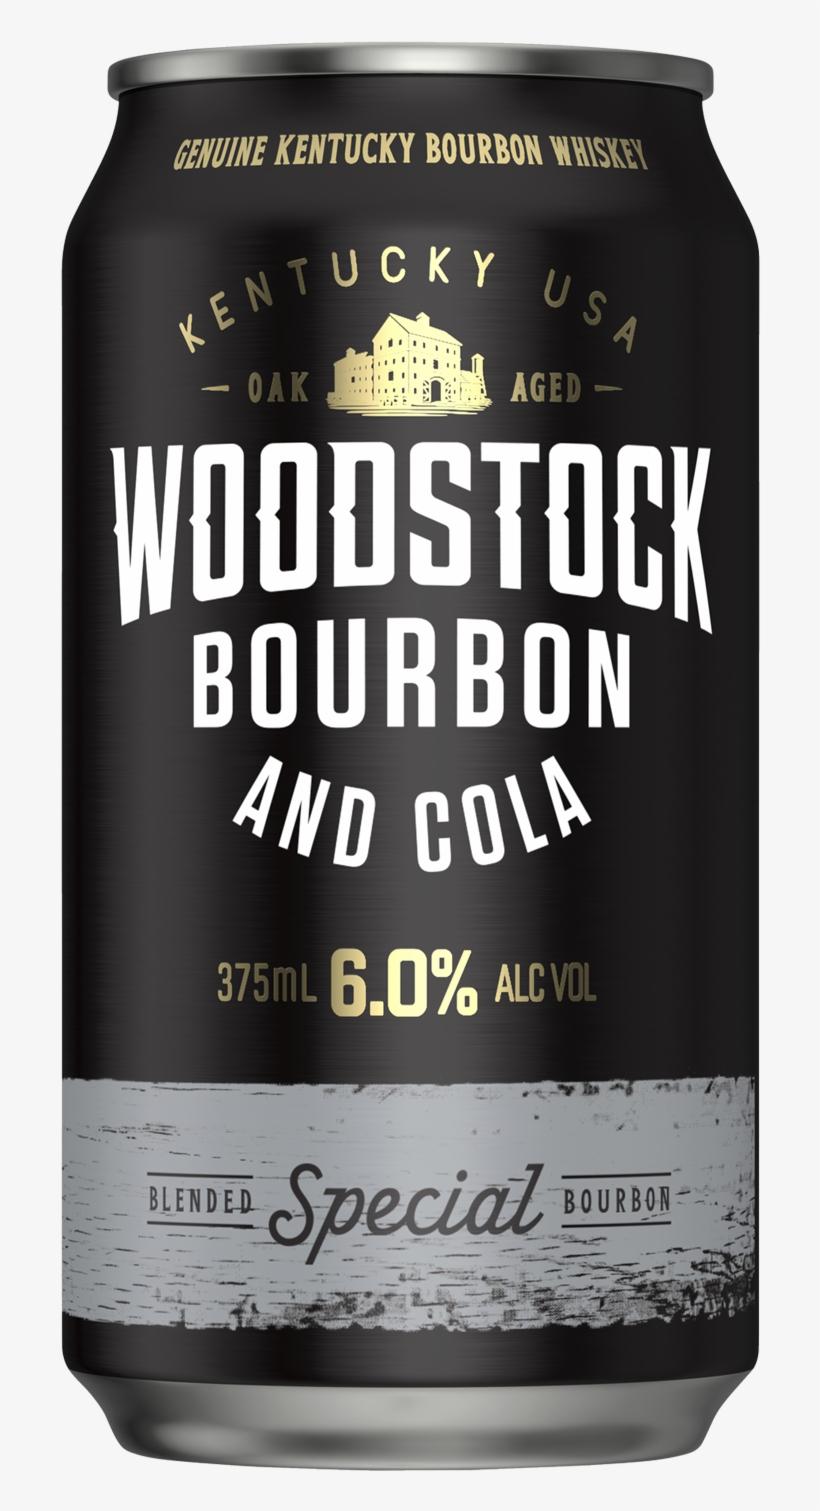 Woodstock Bourbon & Cola Cans 6% 375ml - Woodstock Bourbon & Cola 6% Cans 10 Pack, transparent png #3101227